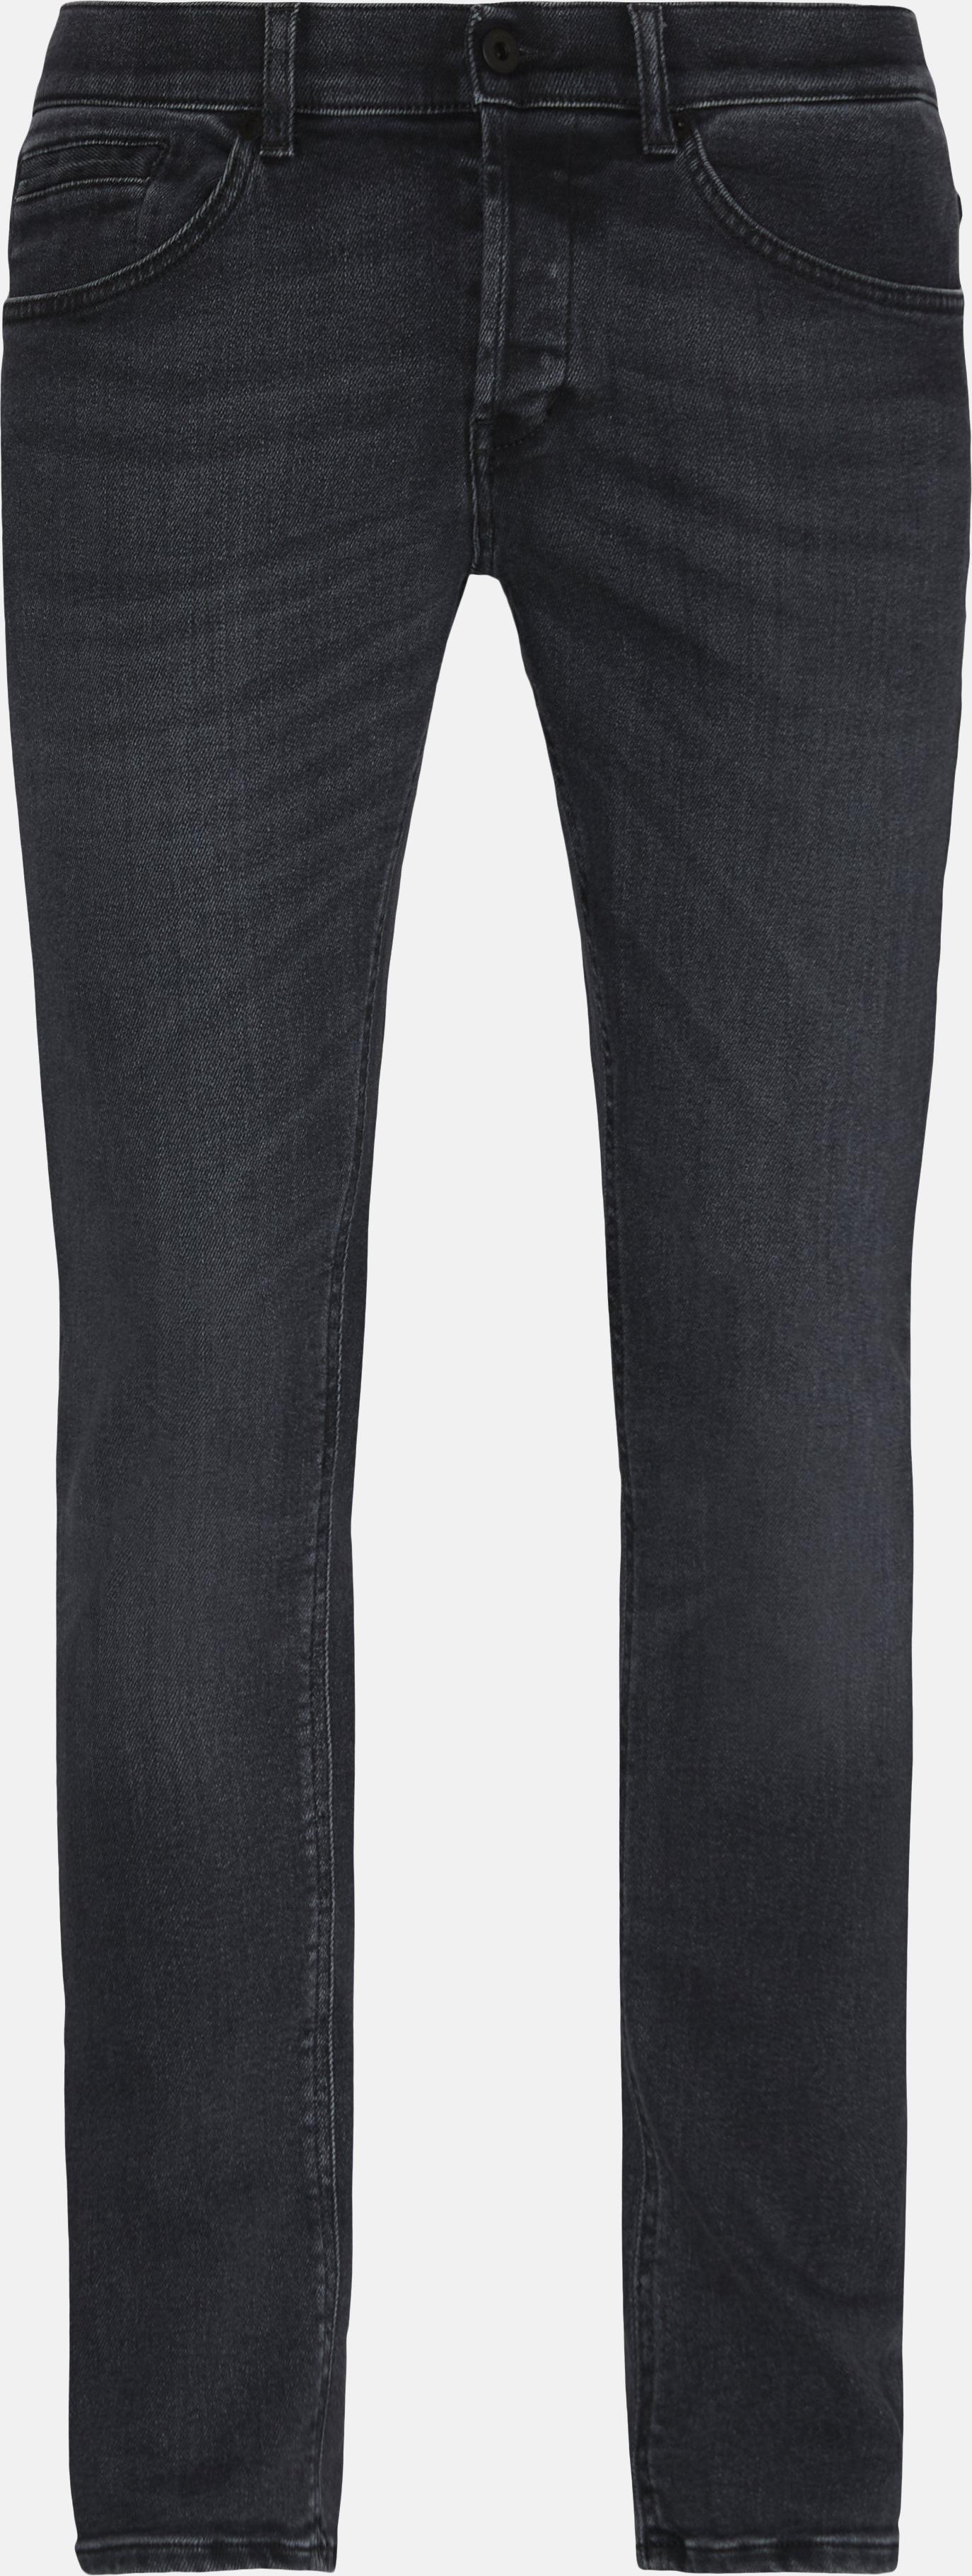 Jeans - Slim fit - Sort